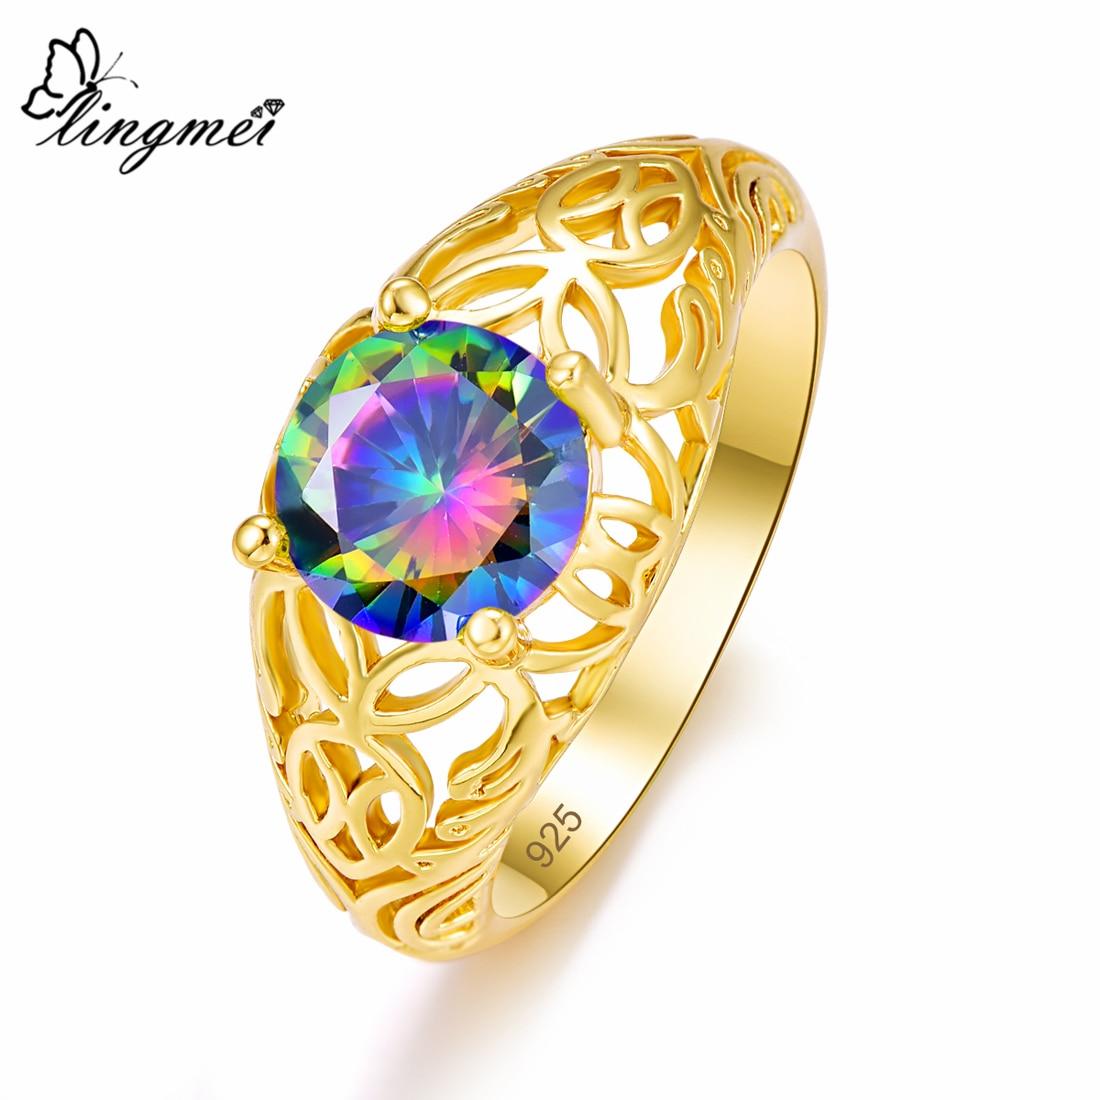 Lingmei, joyería de circonita para fiesta de cóctel de moda, Color plateado, amarillo, dorado, tamaño 6-9, anillos de boda de aniversario